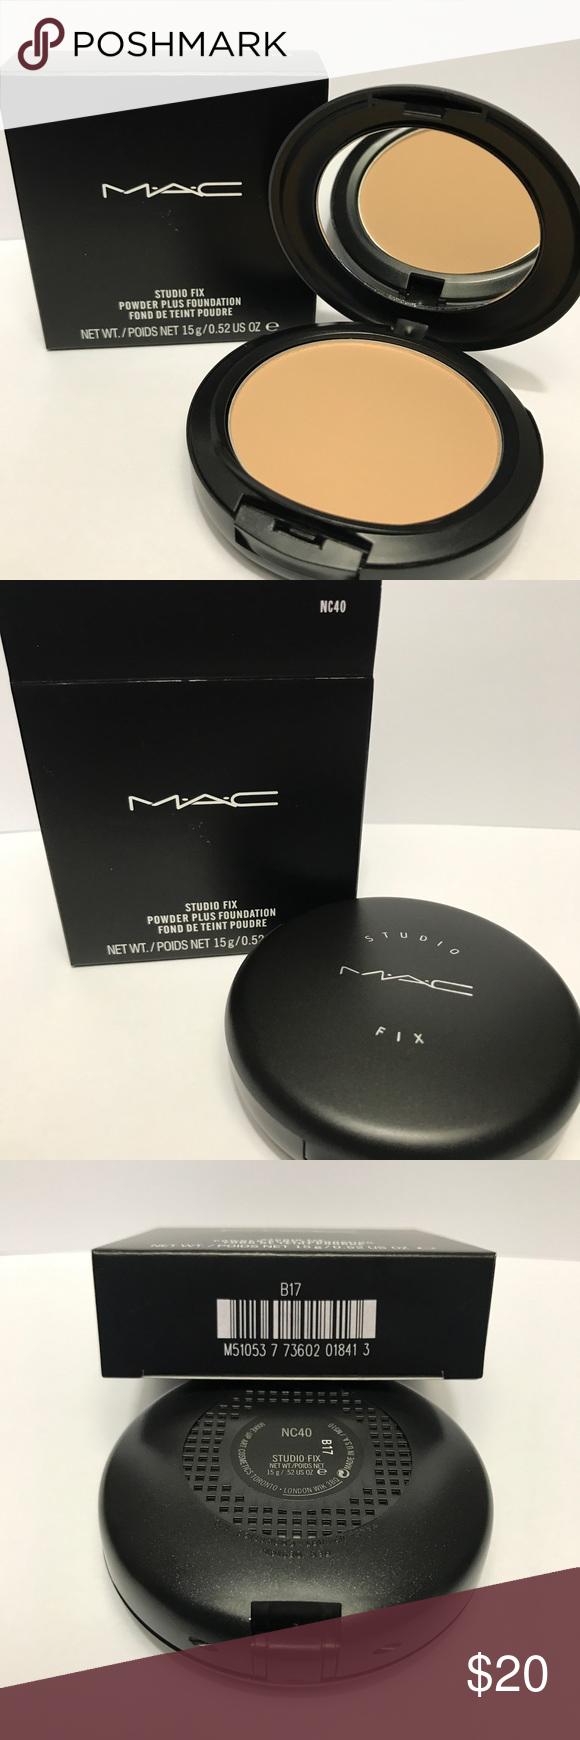 Nc40 Studio Fix Powder Plus Foundation Brand New In The Box 100 Authentic